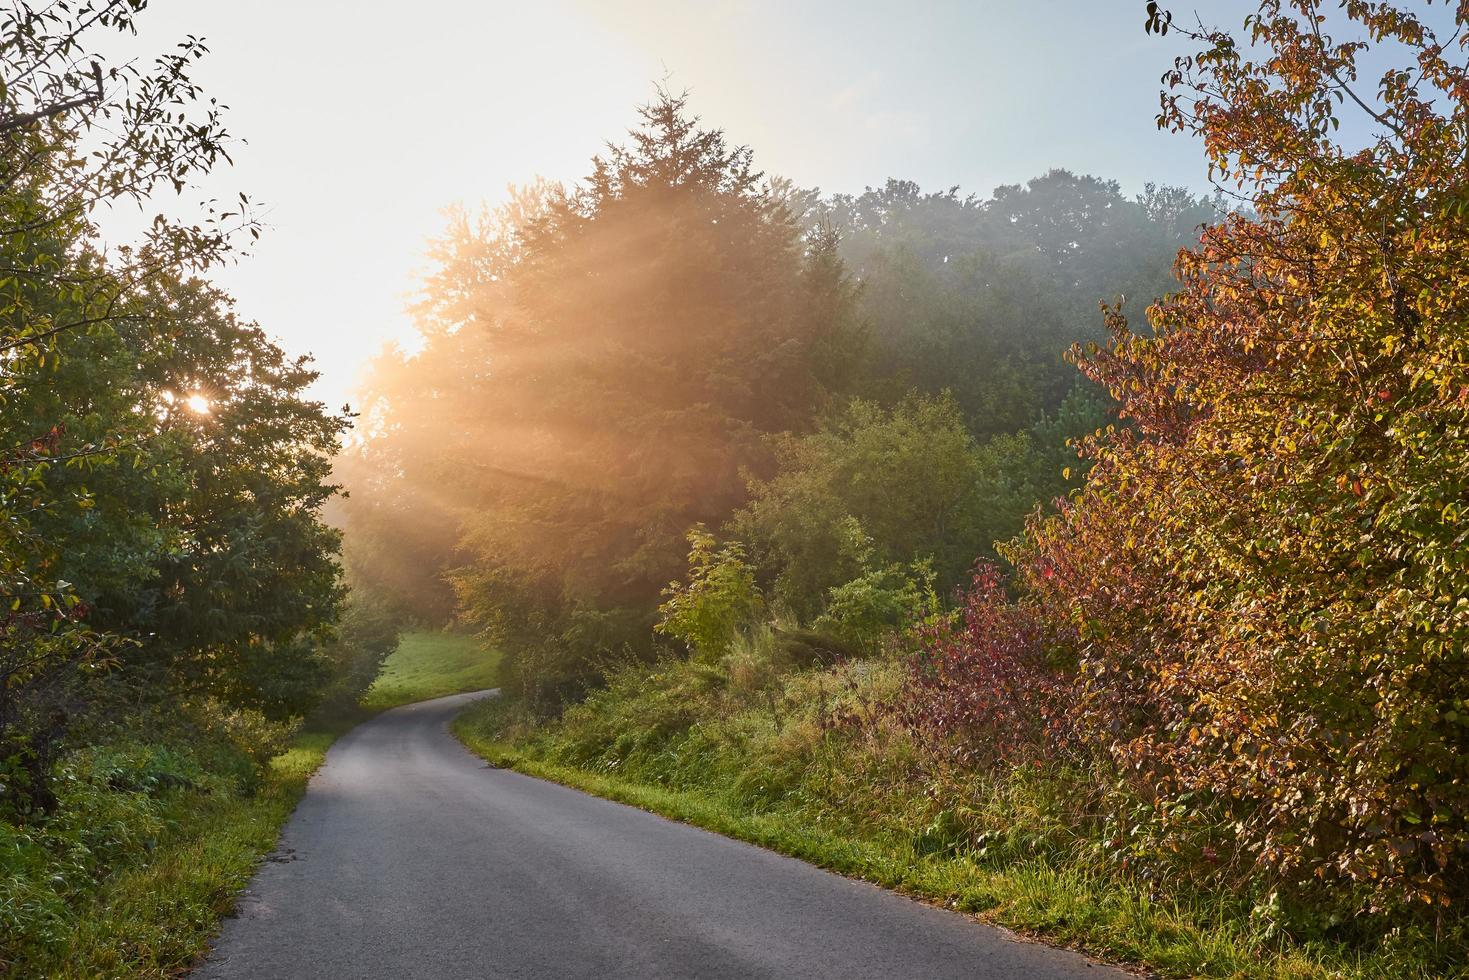 Gray asphalt road between trees photo